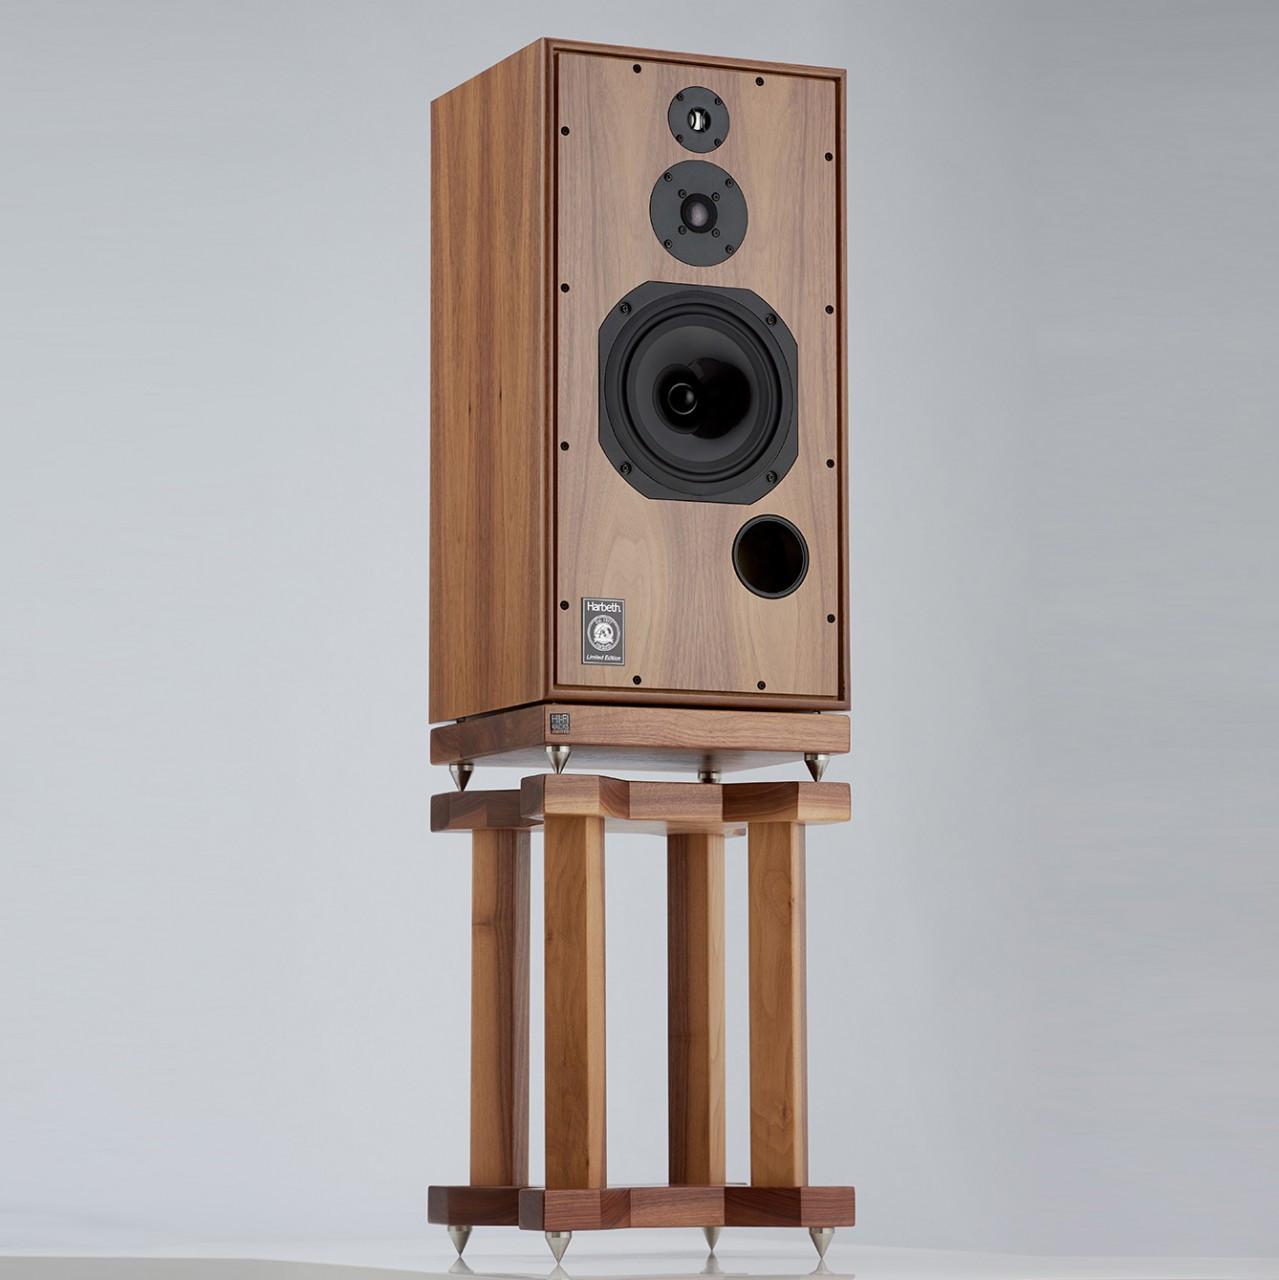 Harbeth Super HL5+ 40th Anniversary speakers